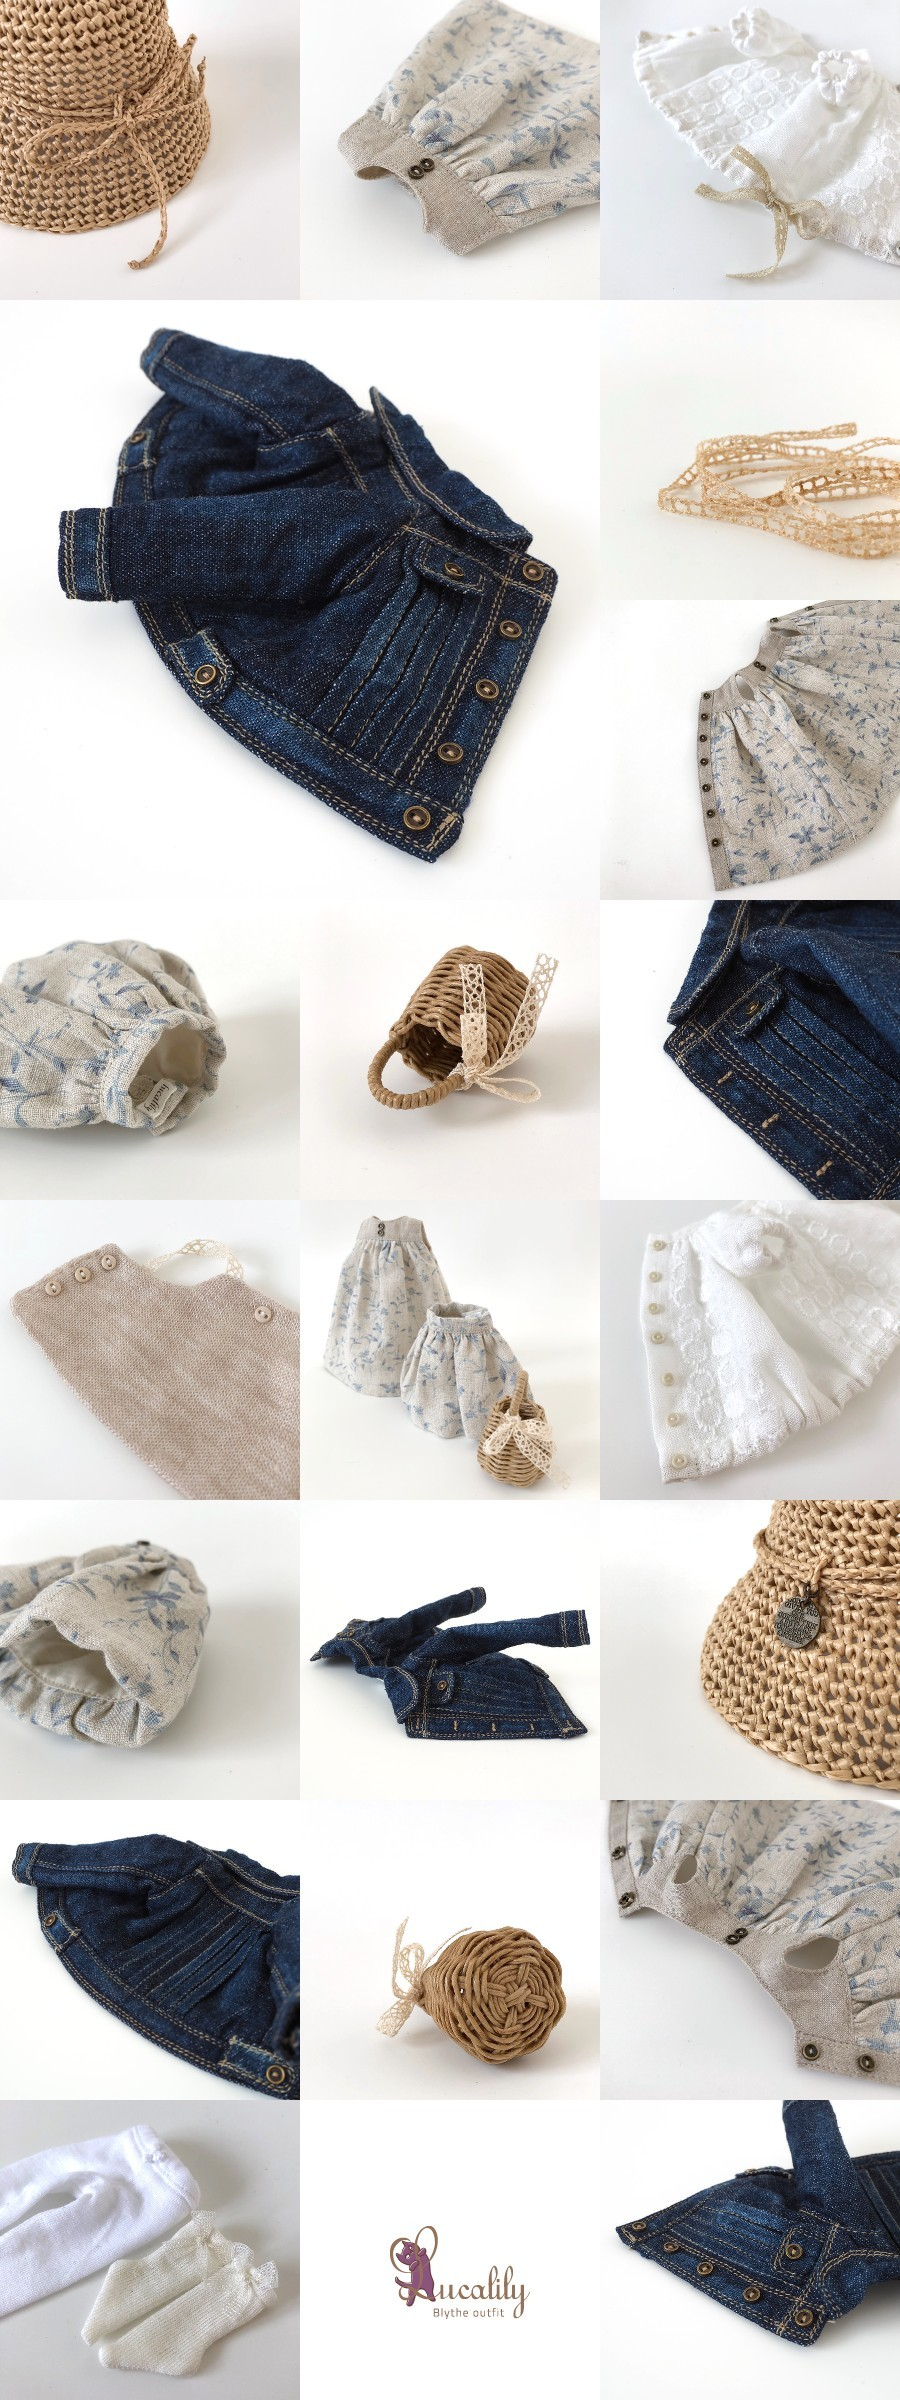 *lucalily * dolls clothes* Denim jacket set *_d0217189_10535042.jpg